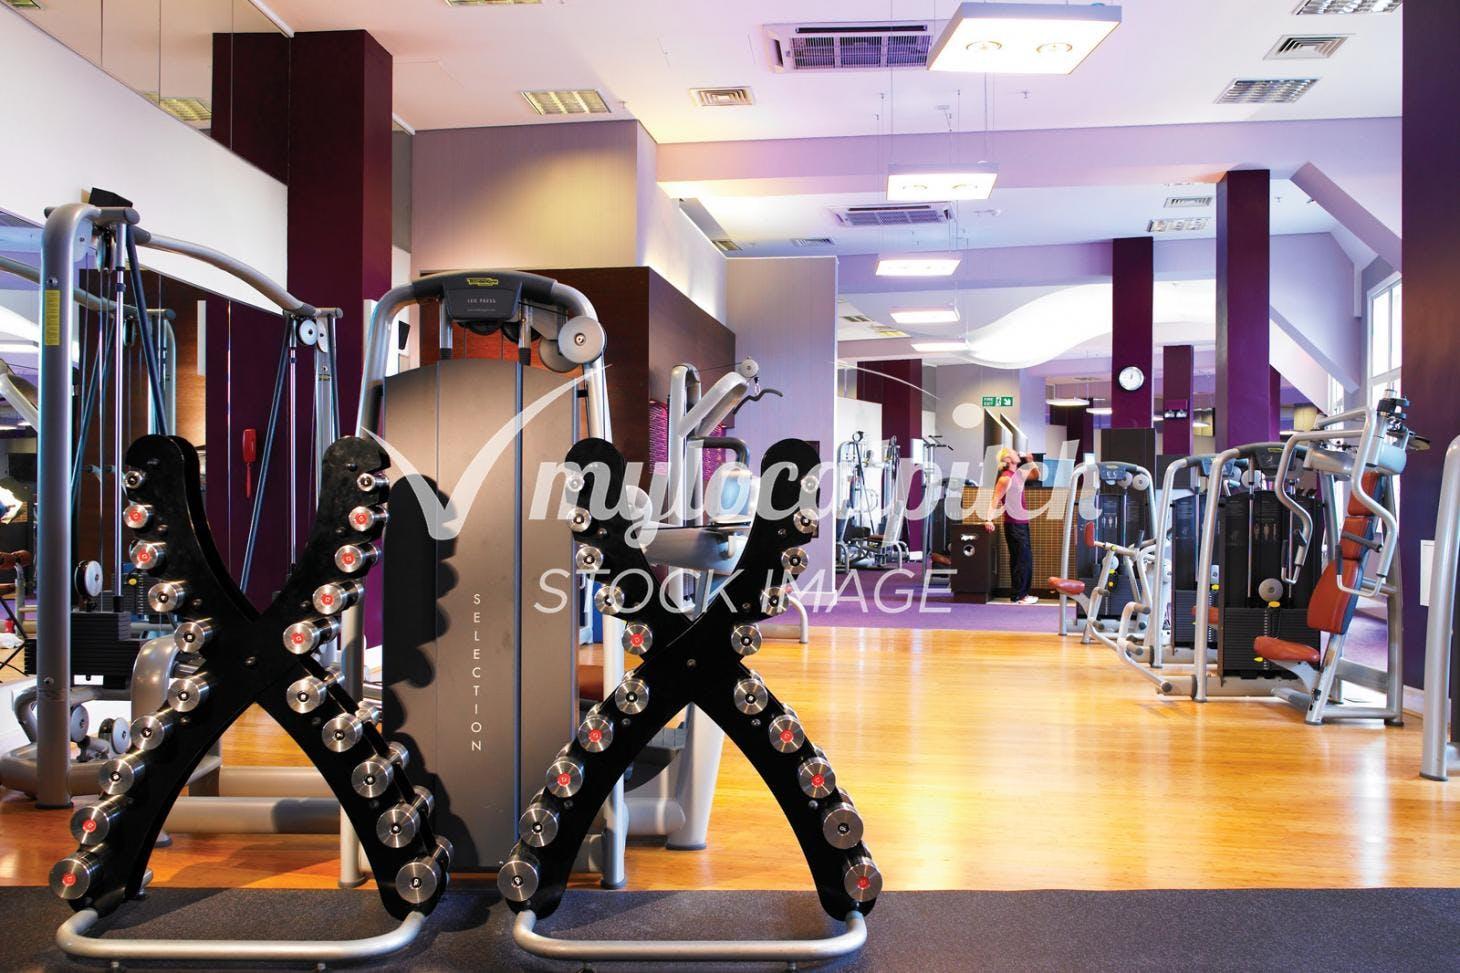 Notting Hill Harbour Club Gym gym